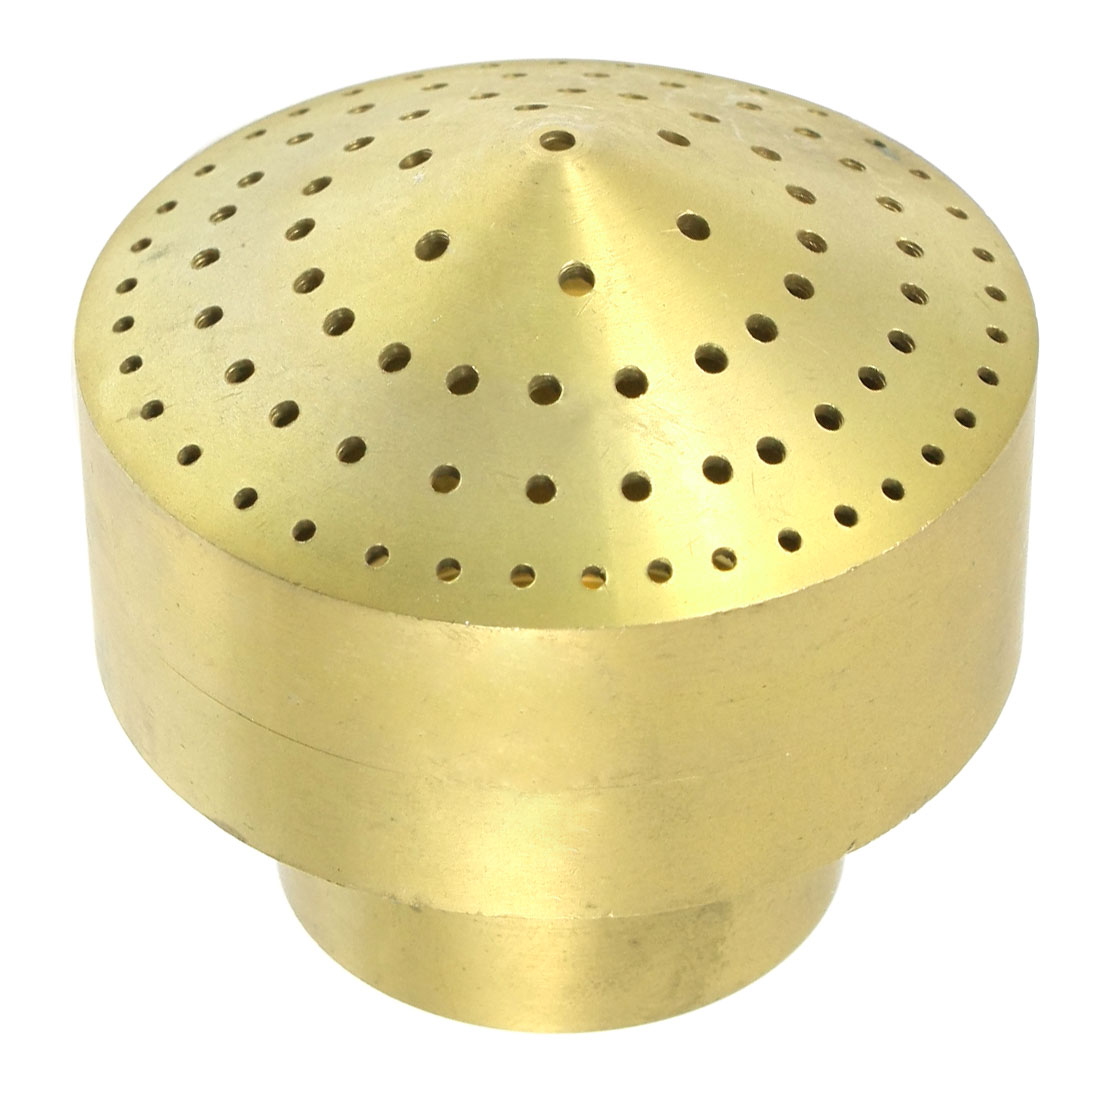 Gardening Fountain 45mm Female Thread Dia Water Spray Sprinkler Nozzle Brass Tone